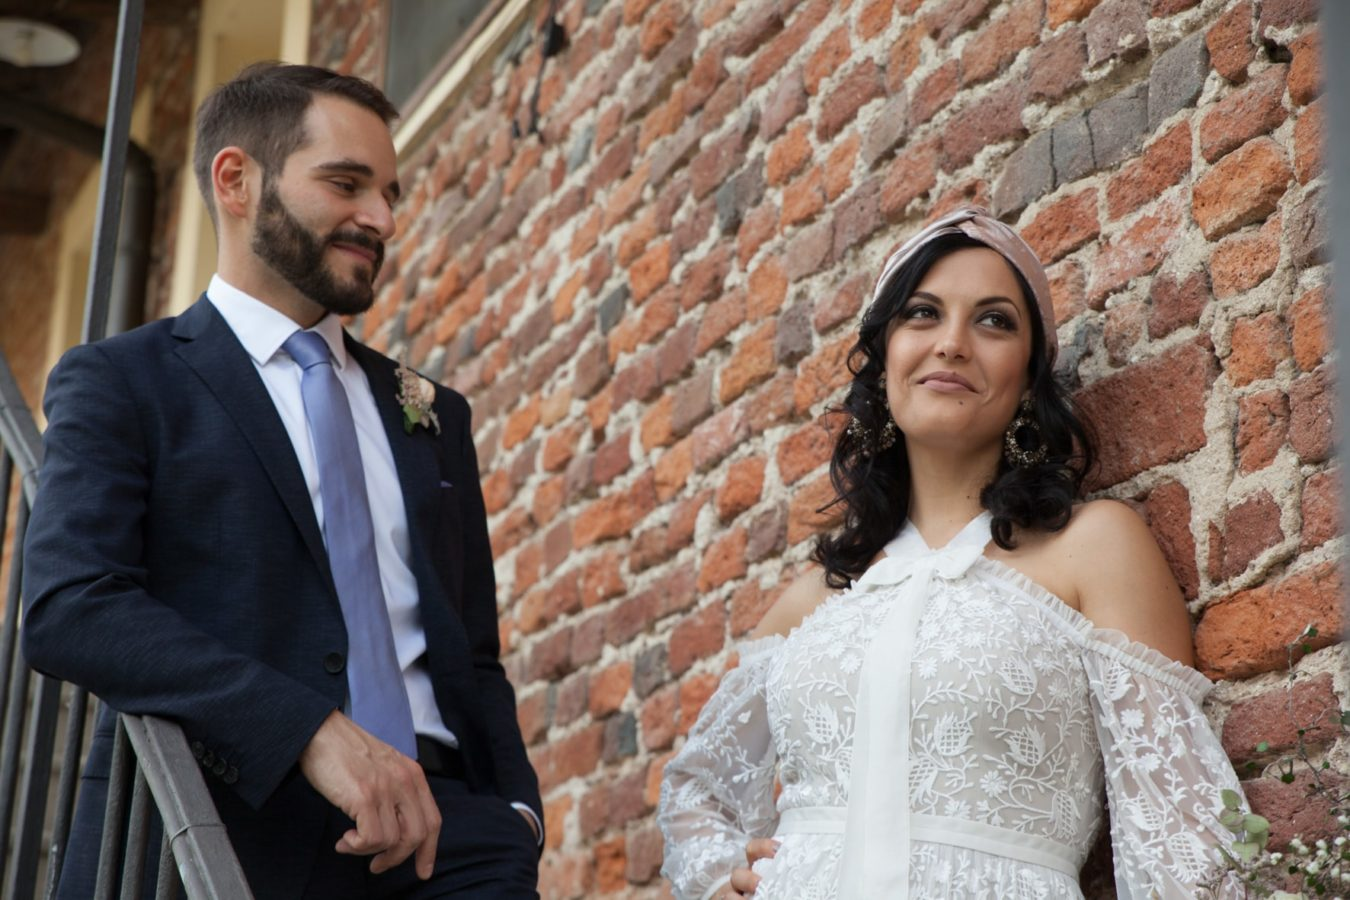 048 Irina e Fabio-min